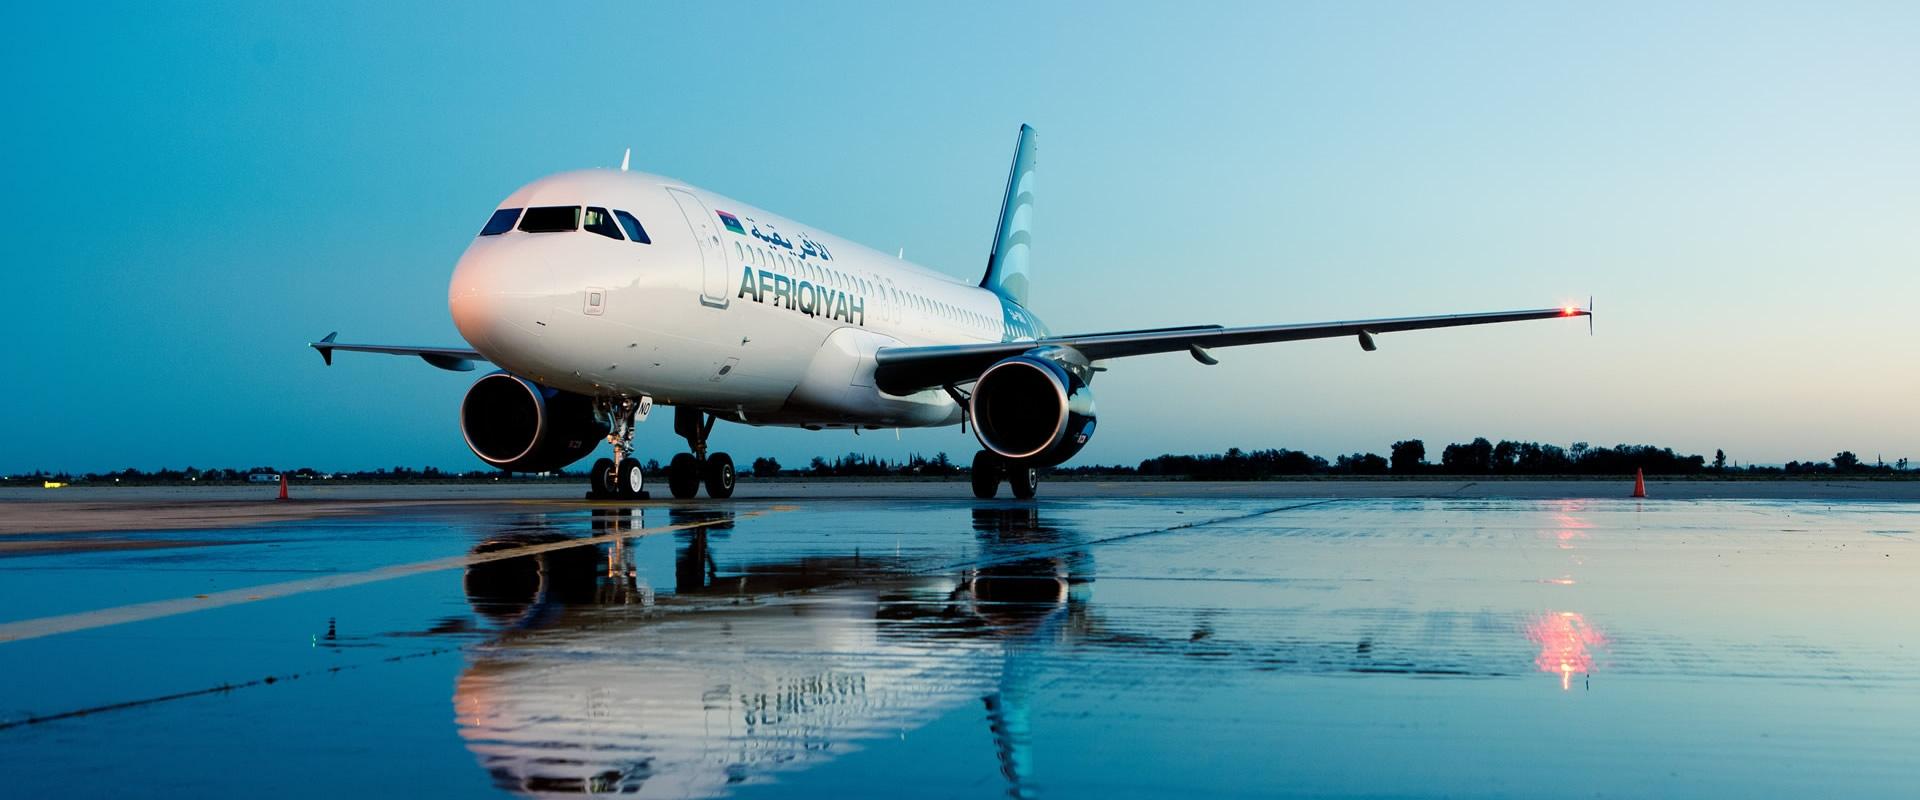 aircraft maintainence essay